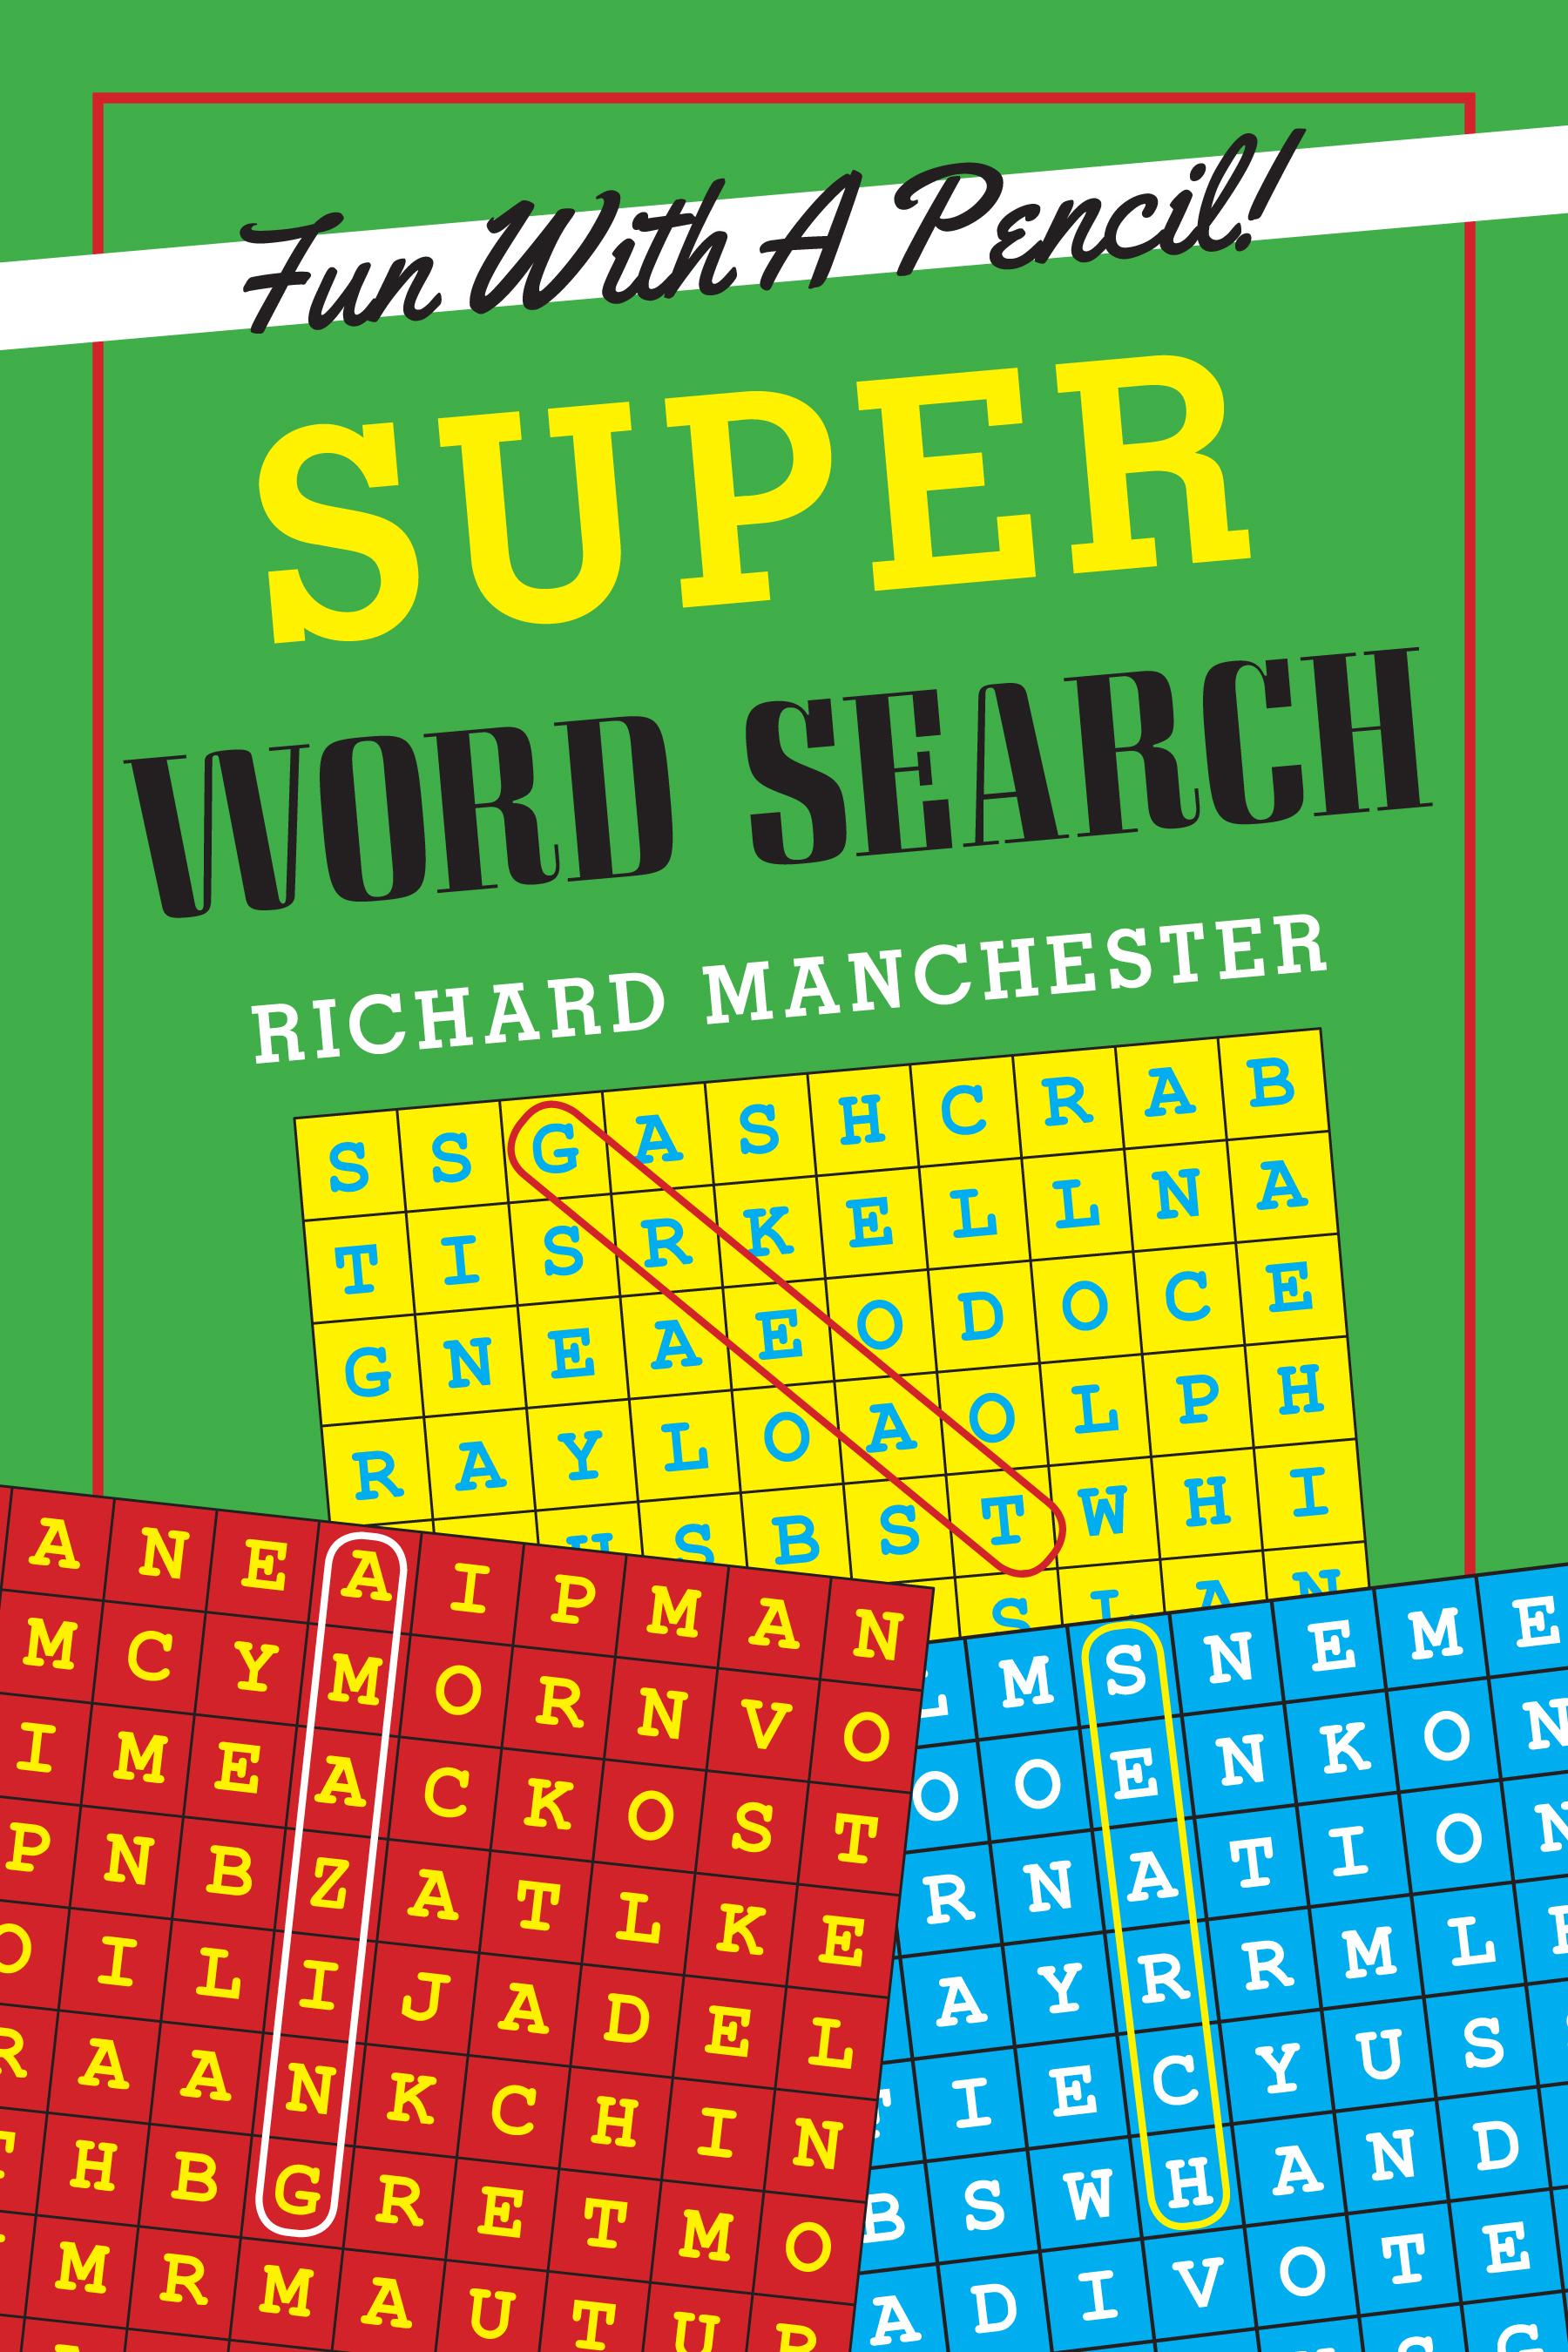 Bristol-FunWithAPencil-SuperWordSearch-6x9x300dpi-1.jpg